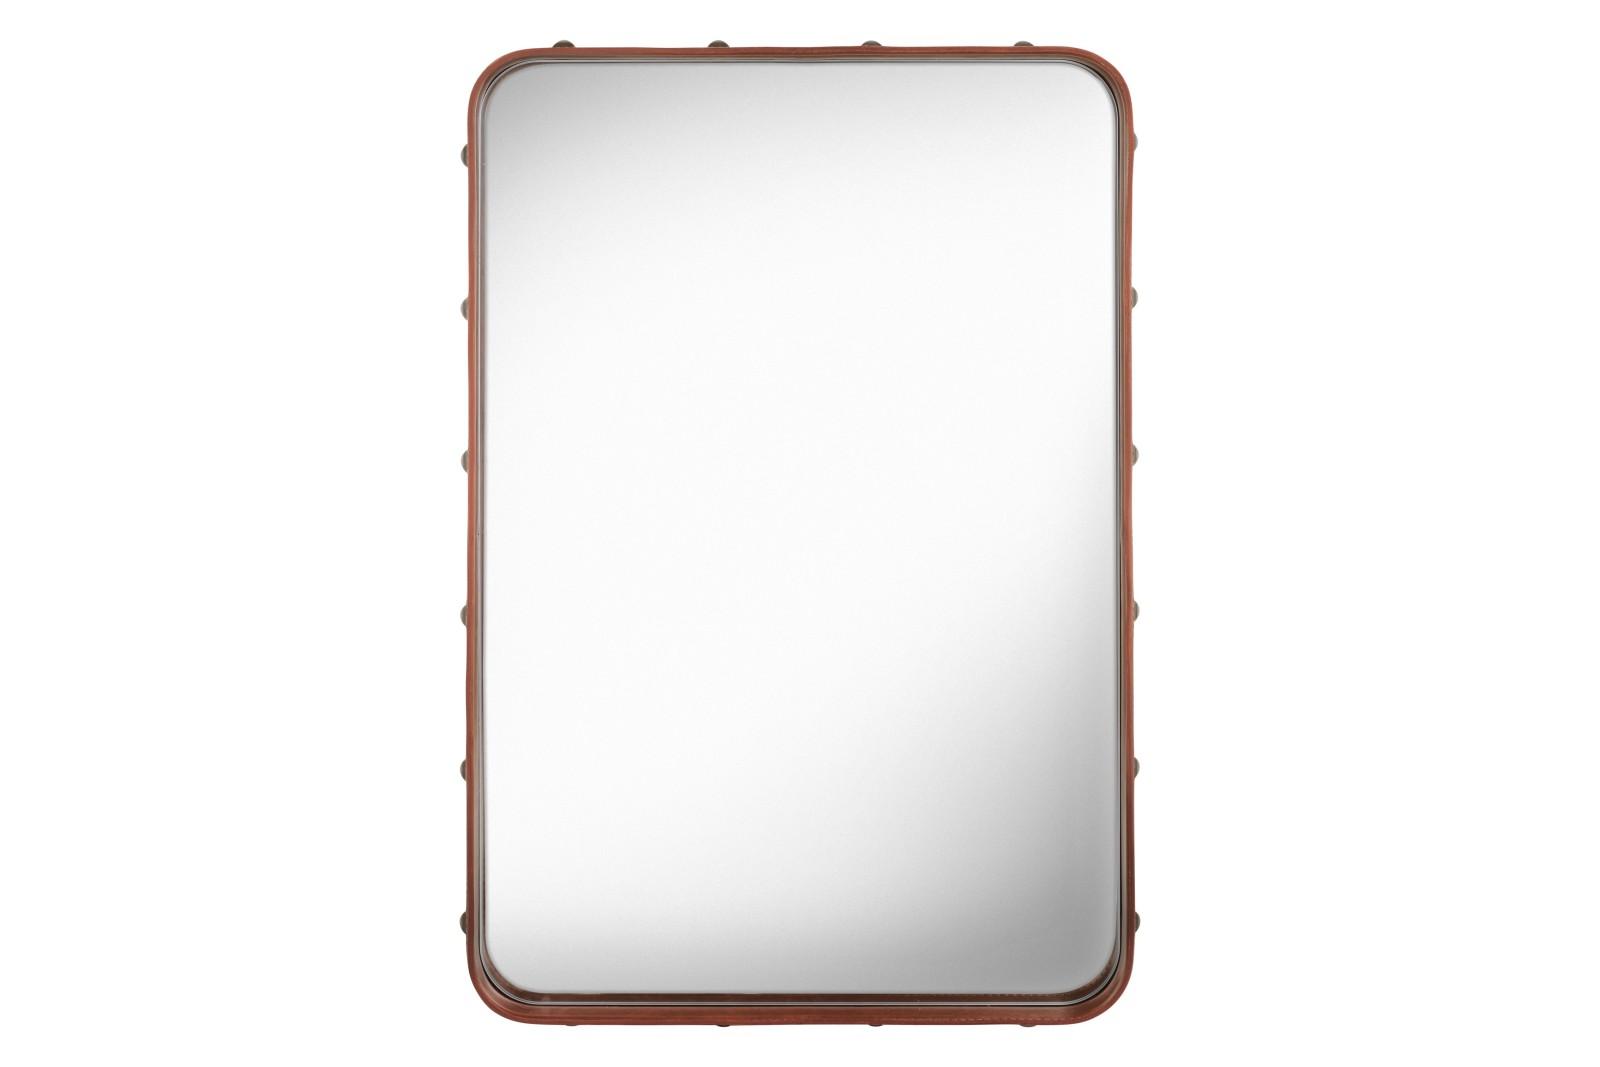 Adnet Wall Mirror, Rectangular, 50x70 Tan leather